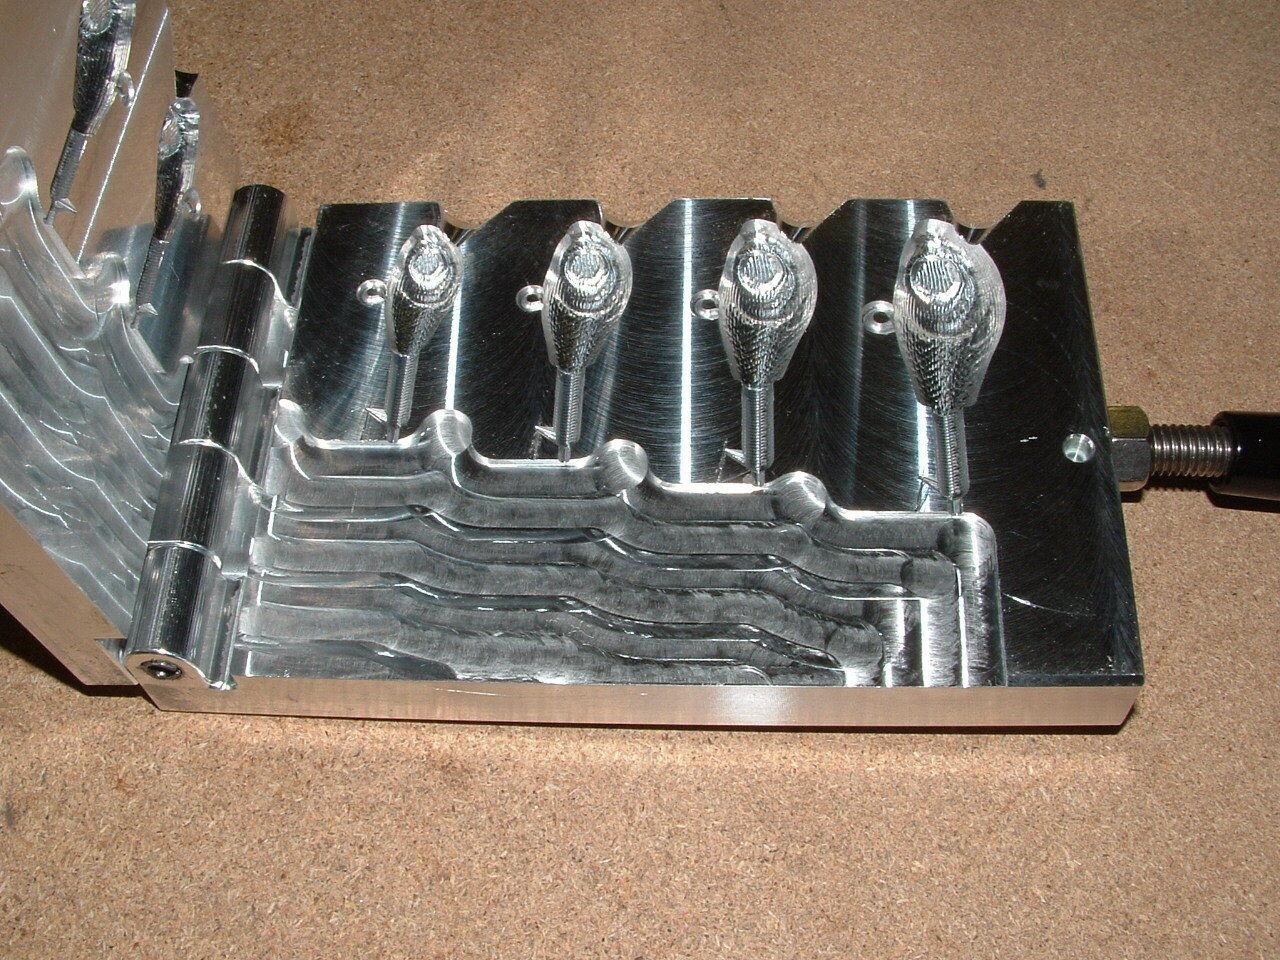 Saltwater Guppy Jig Barbed mold 1,1.5,2,3oz CNC Aluminum